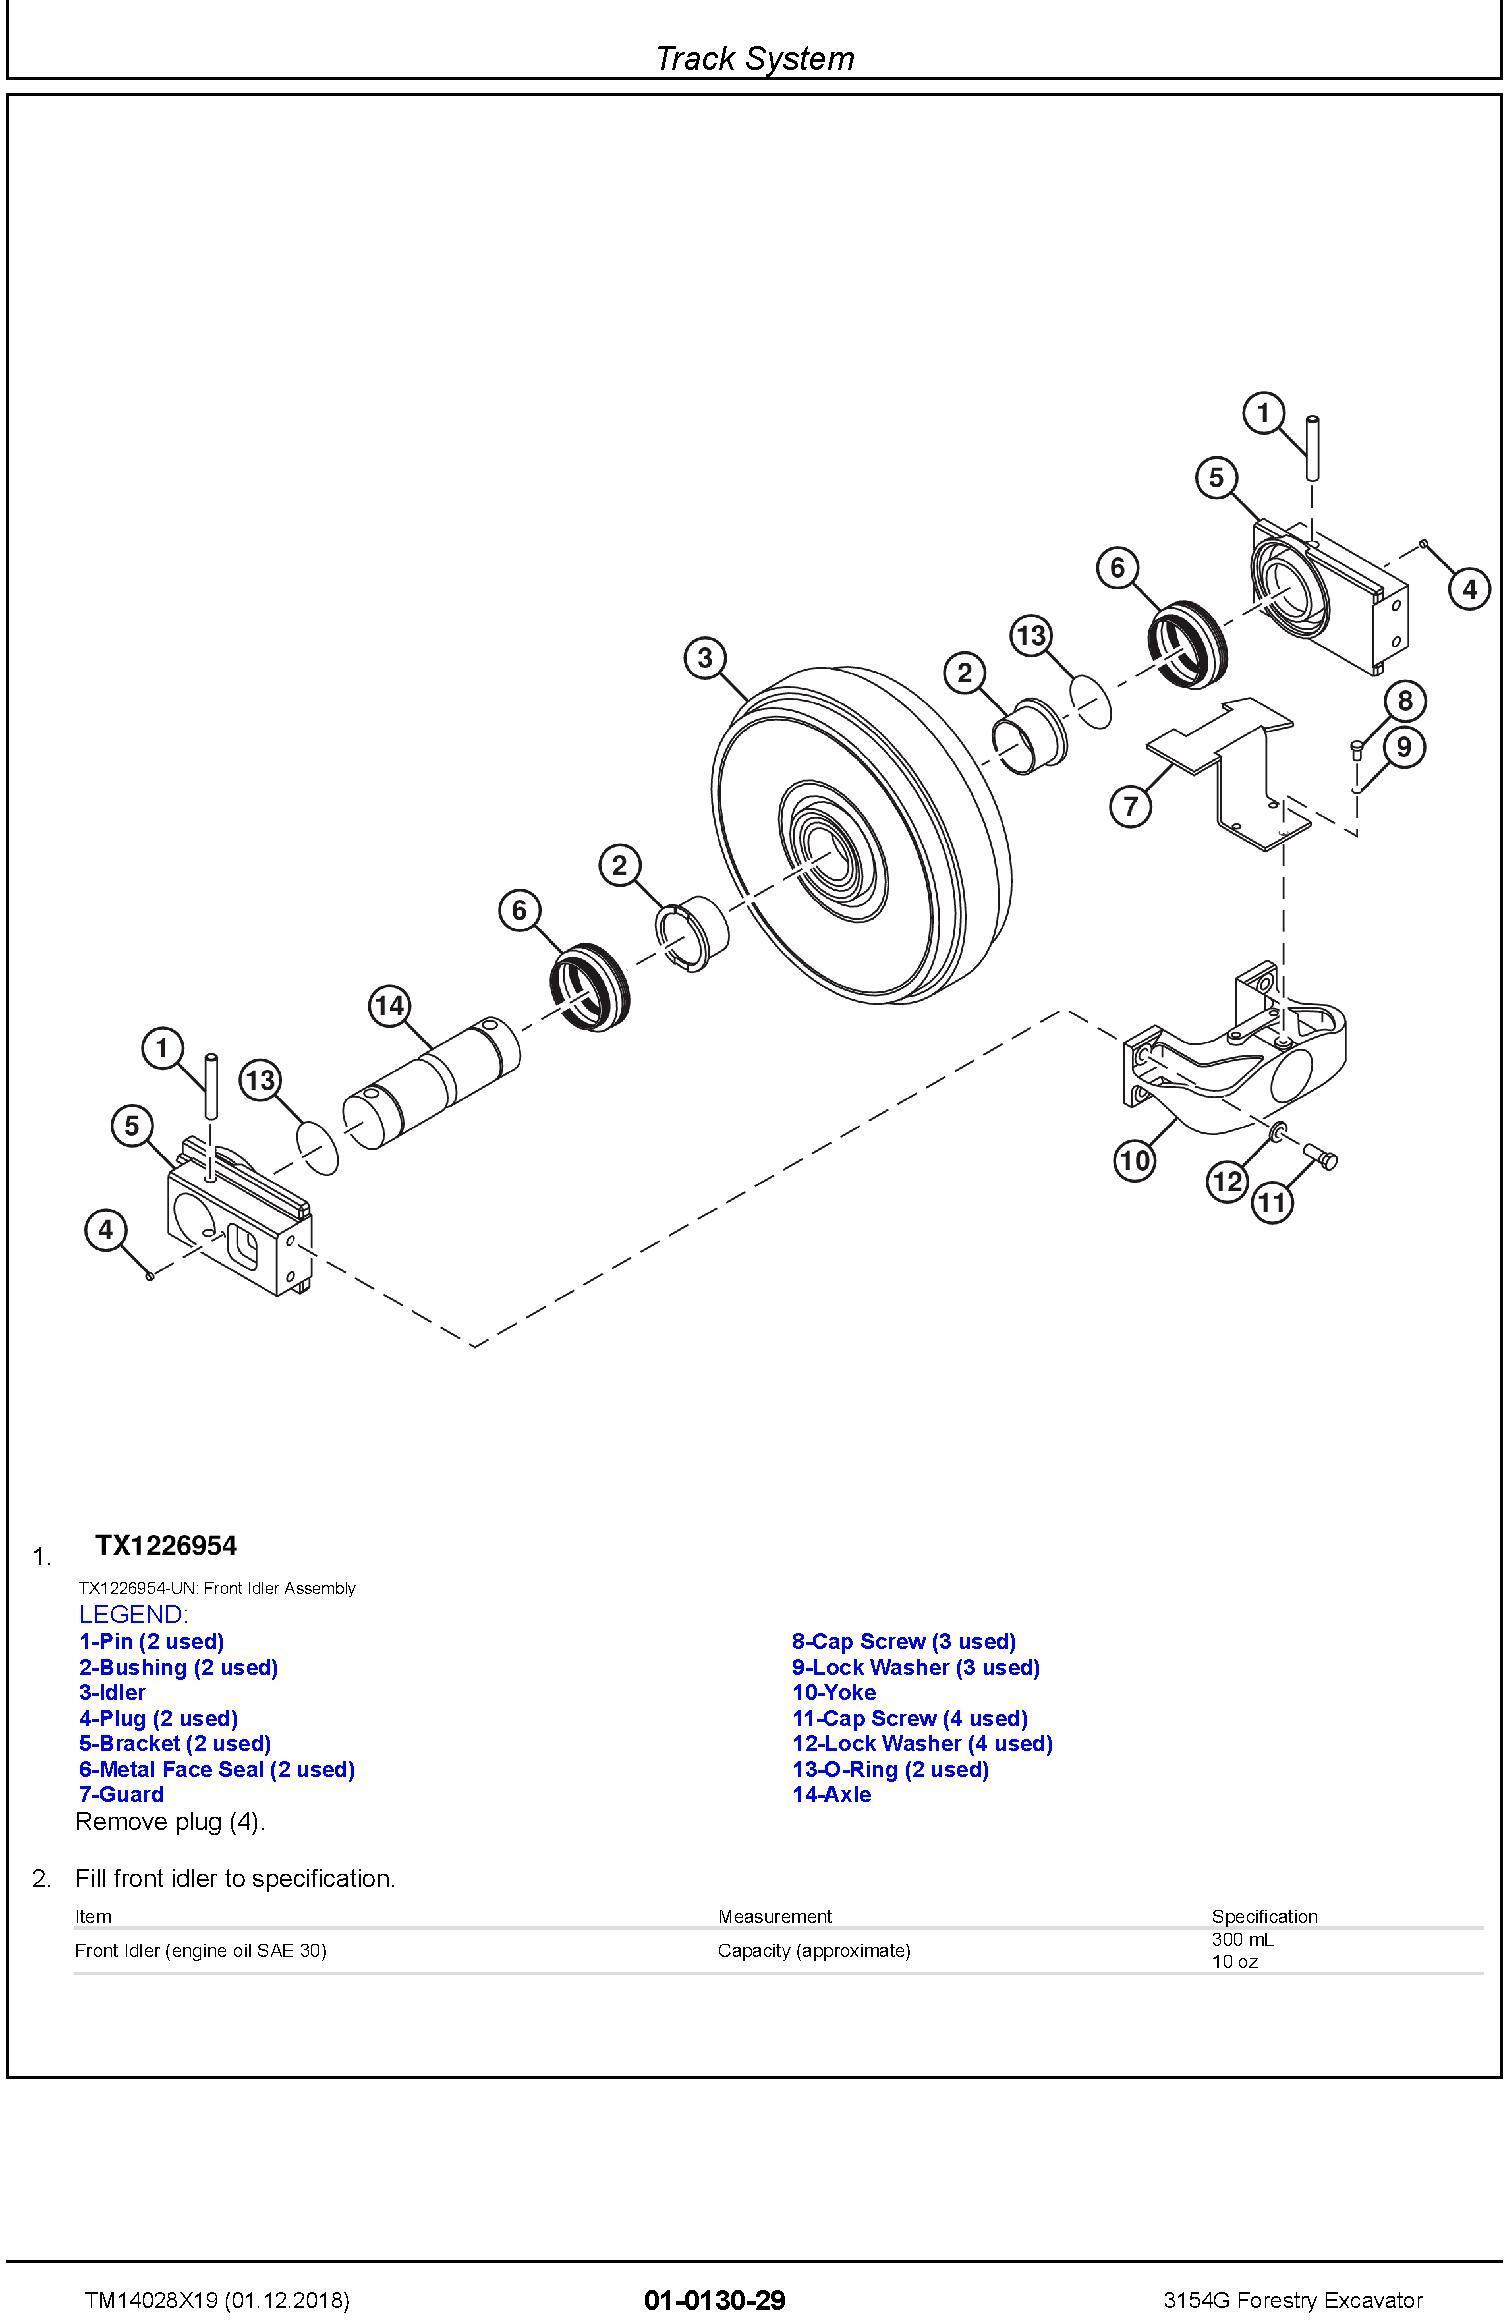 John Deere 3154G (SN. D310001-) Forestry Excavator Service Repair Technical Manual (TM14028X19) - 1